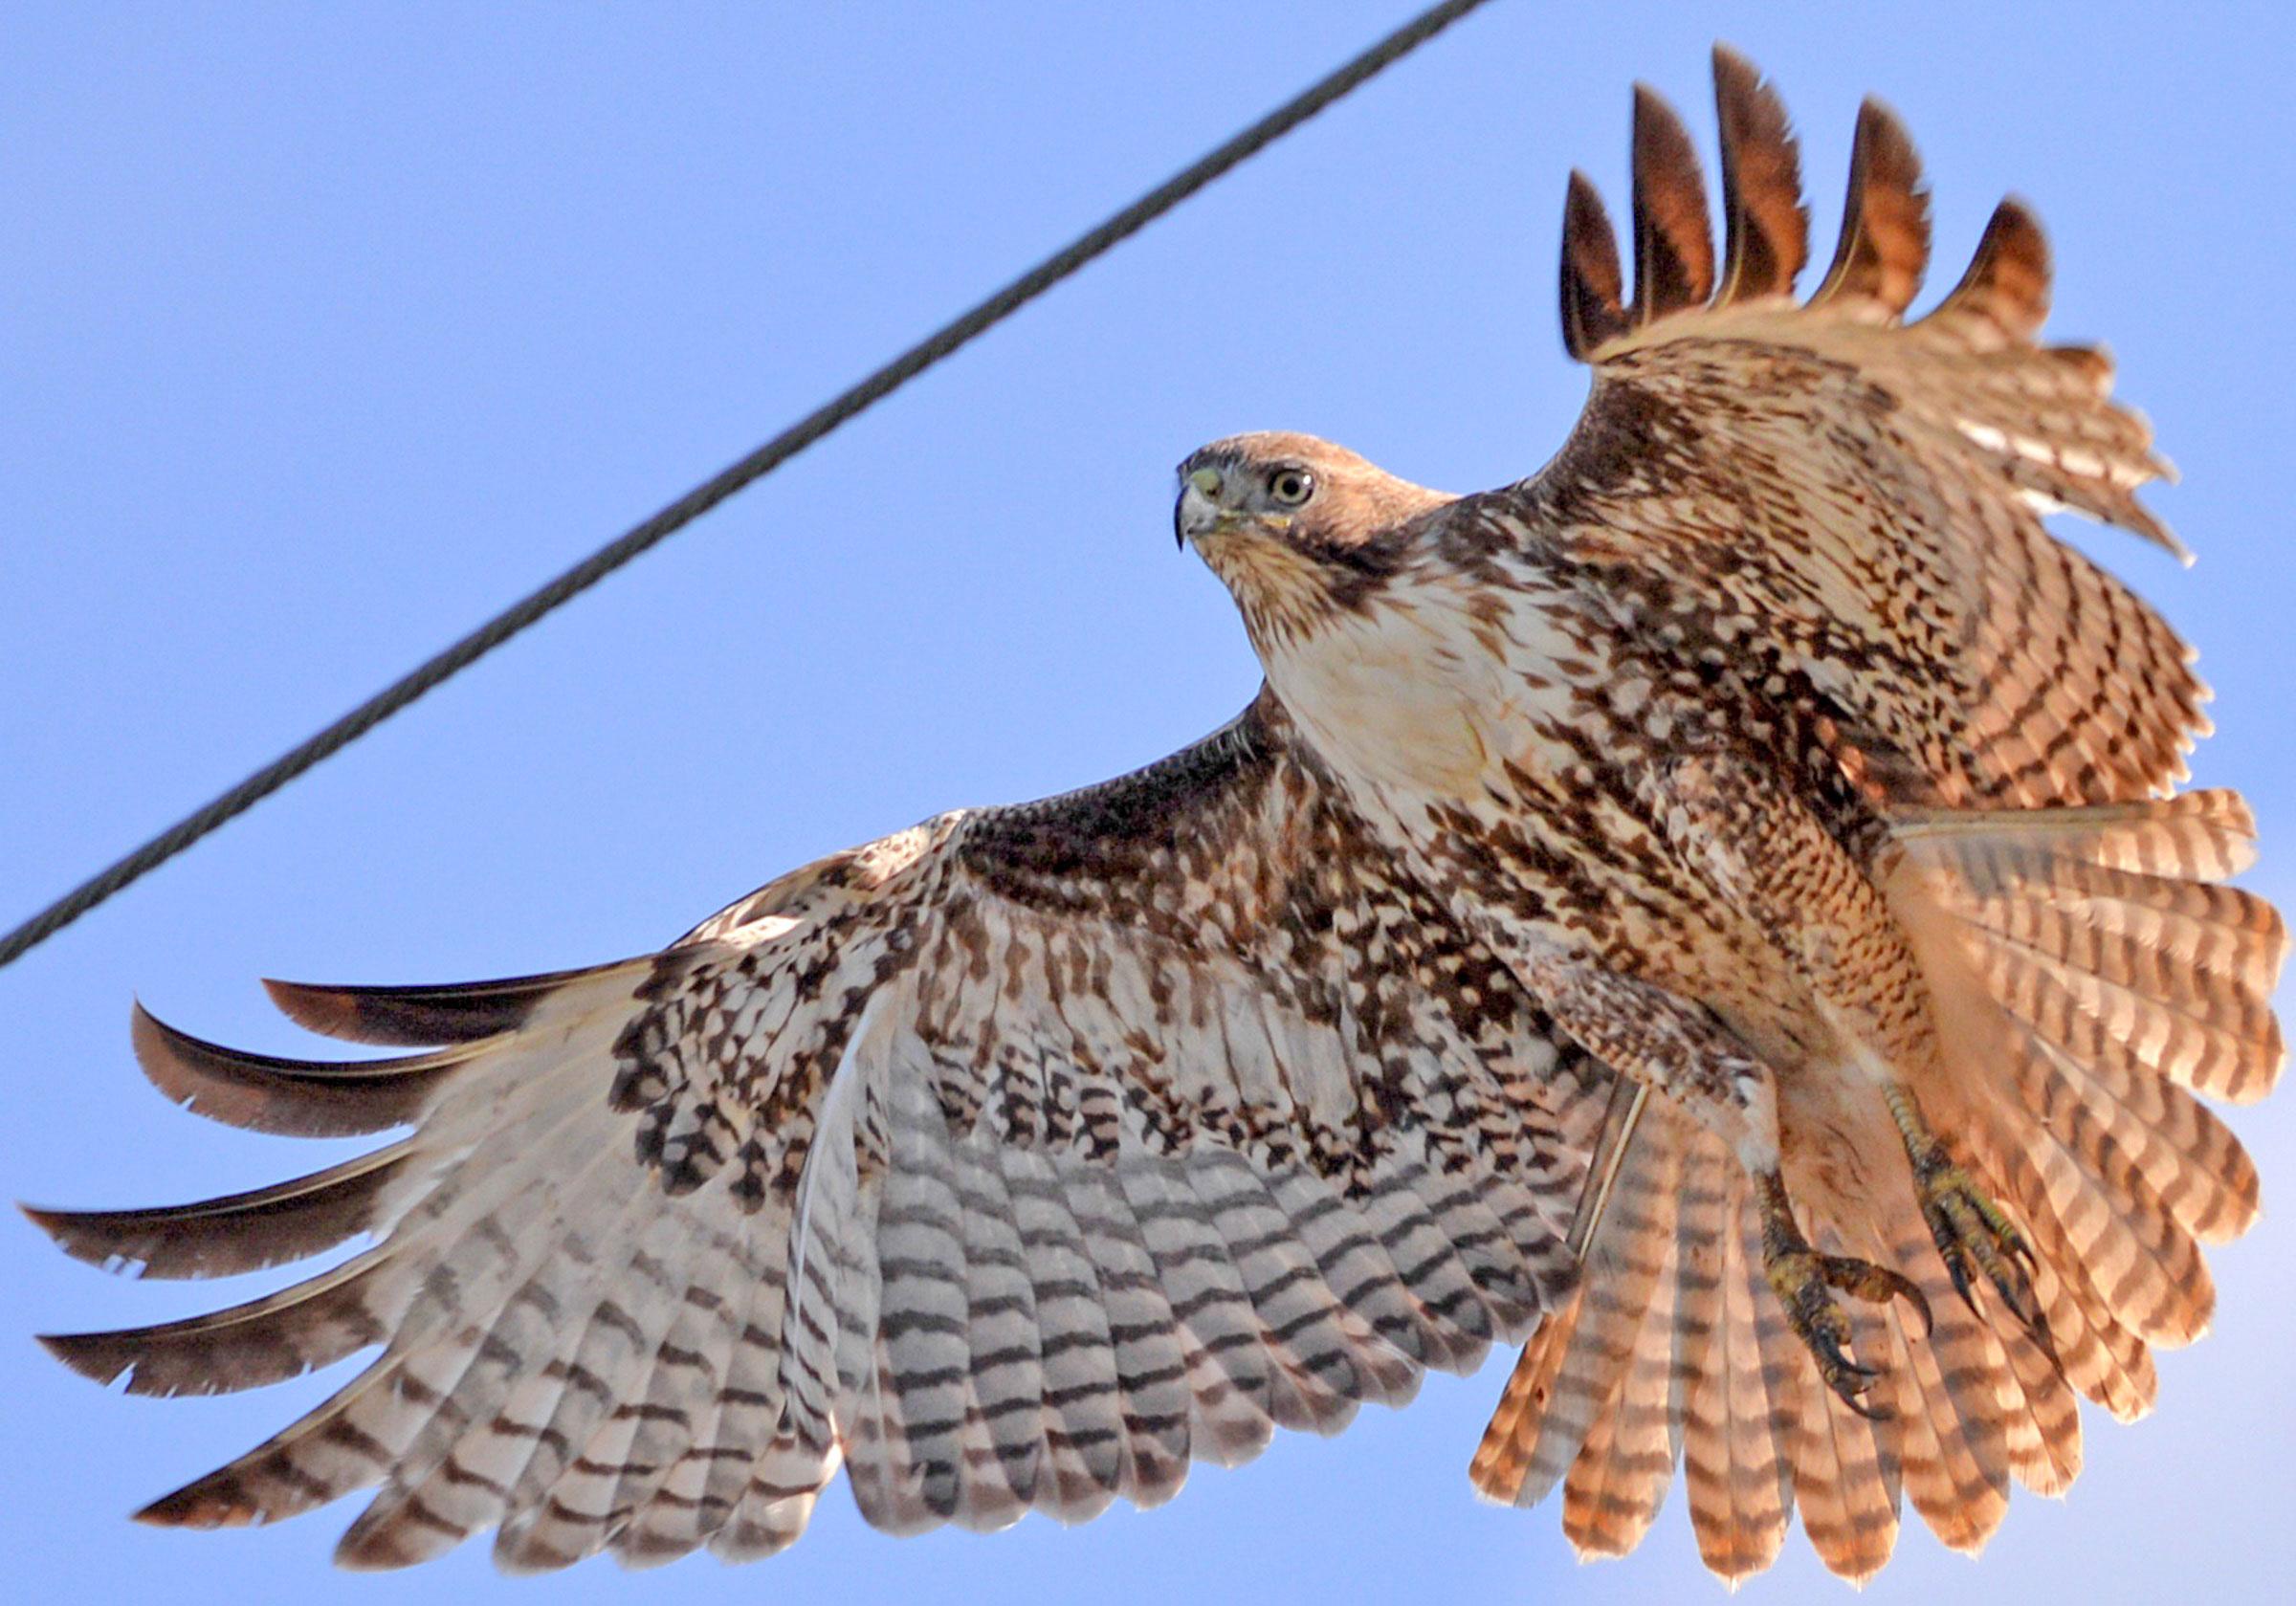 Red-tailed Hawk. Lorna Padden/Audubon Photography Awards